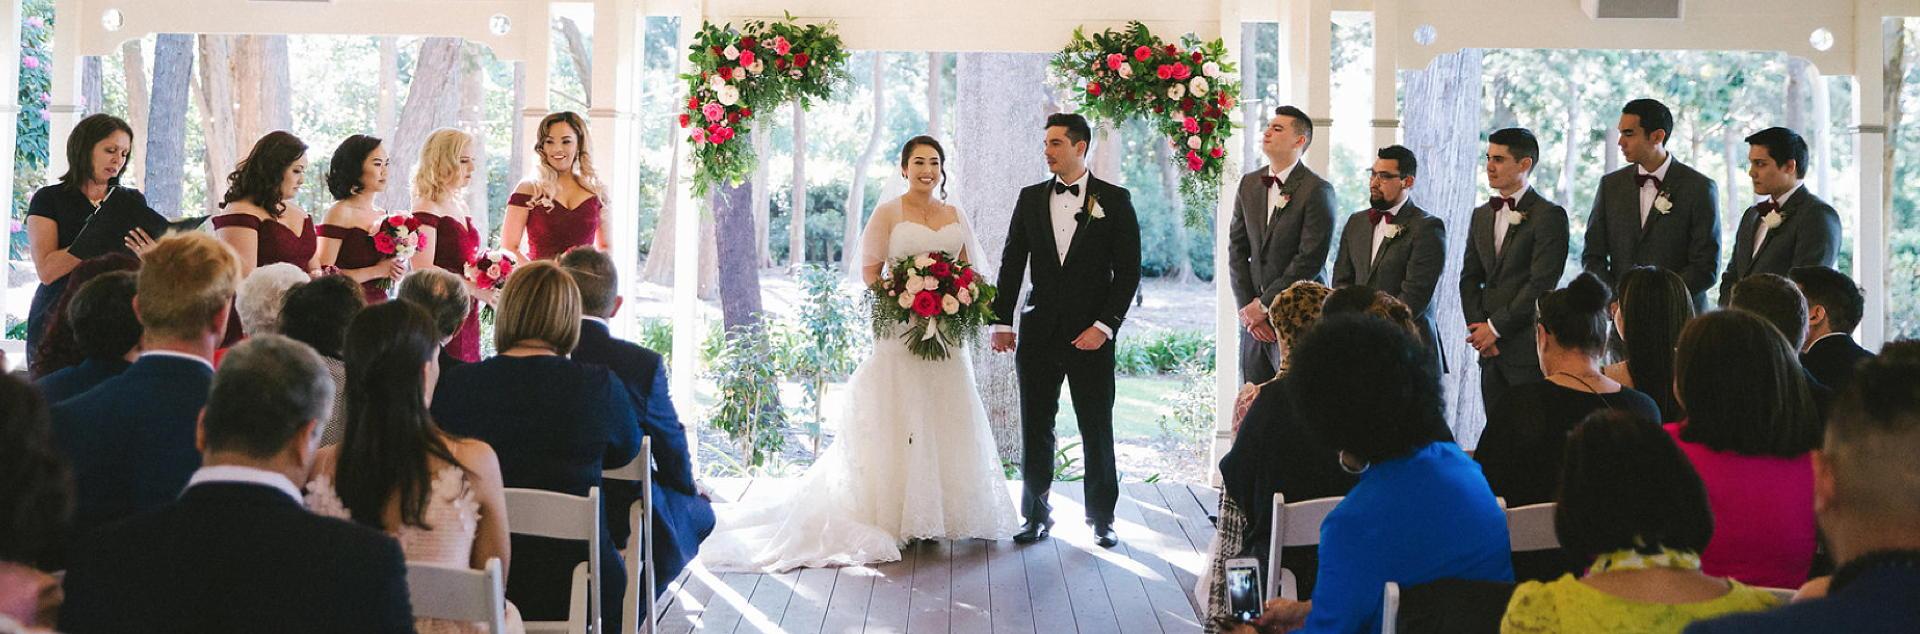 "Normal Wedding ""Hero"" Image"